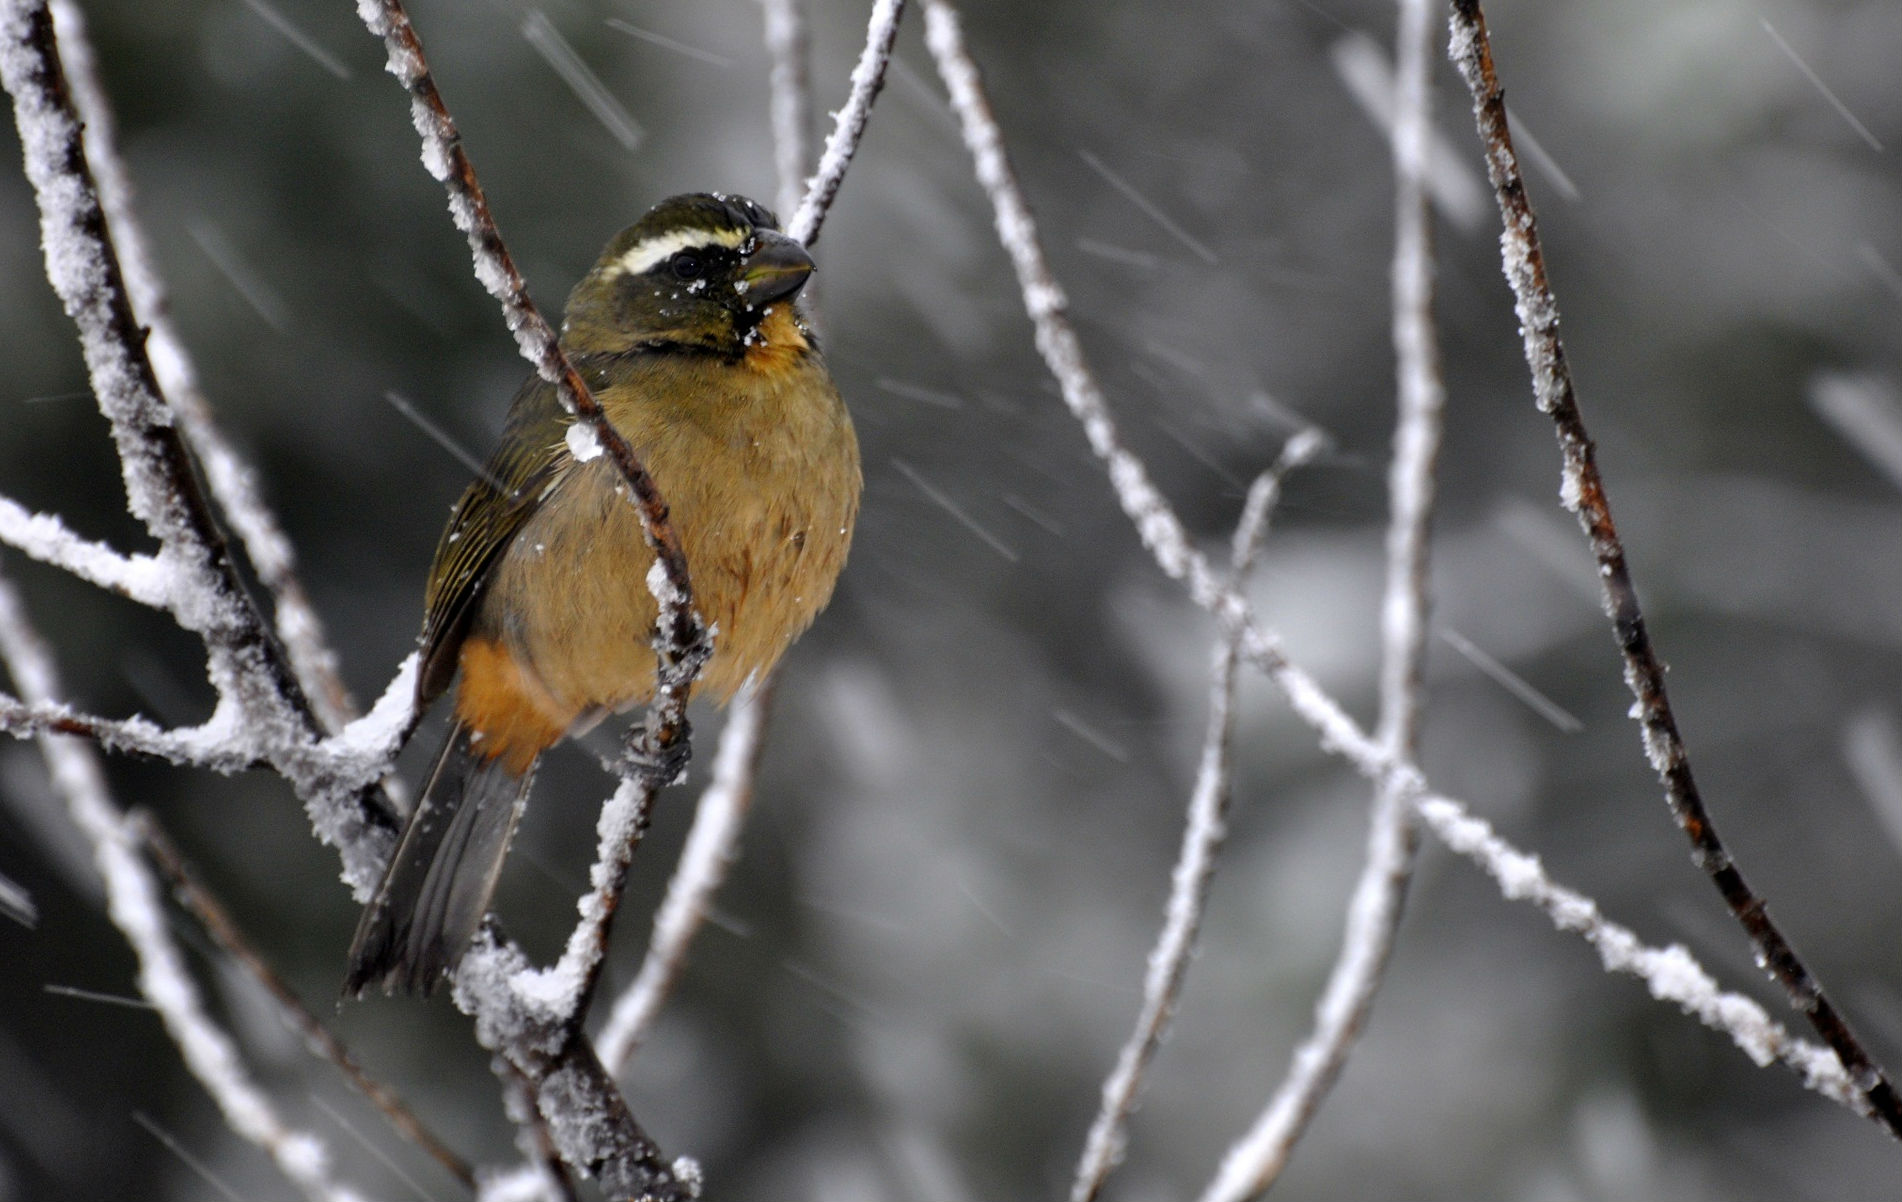 Pássaro Bico-Grosso, nome científico: Saltator maxillosus